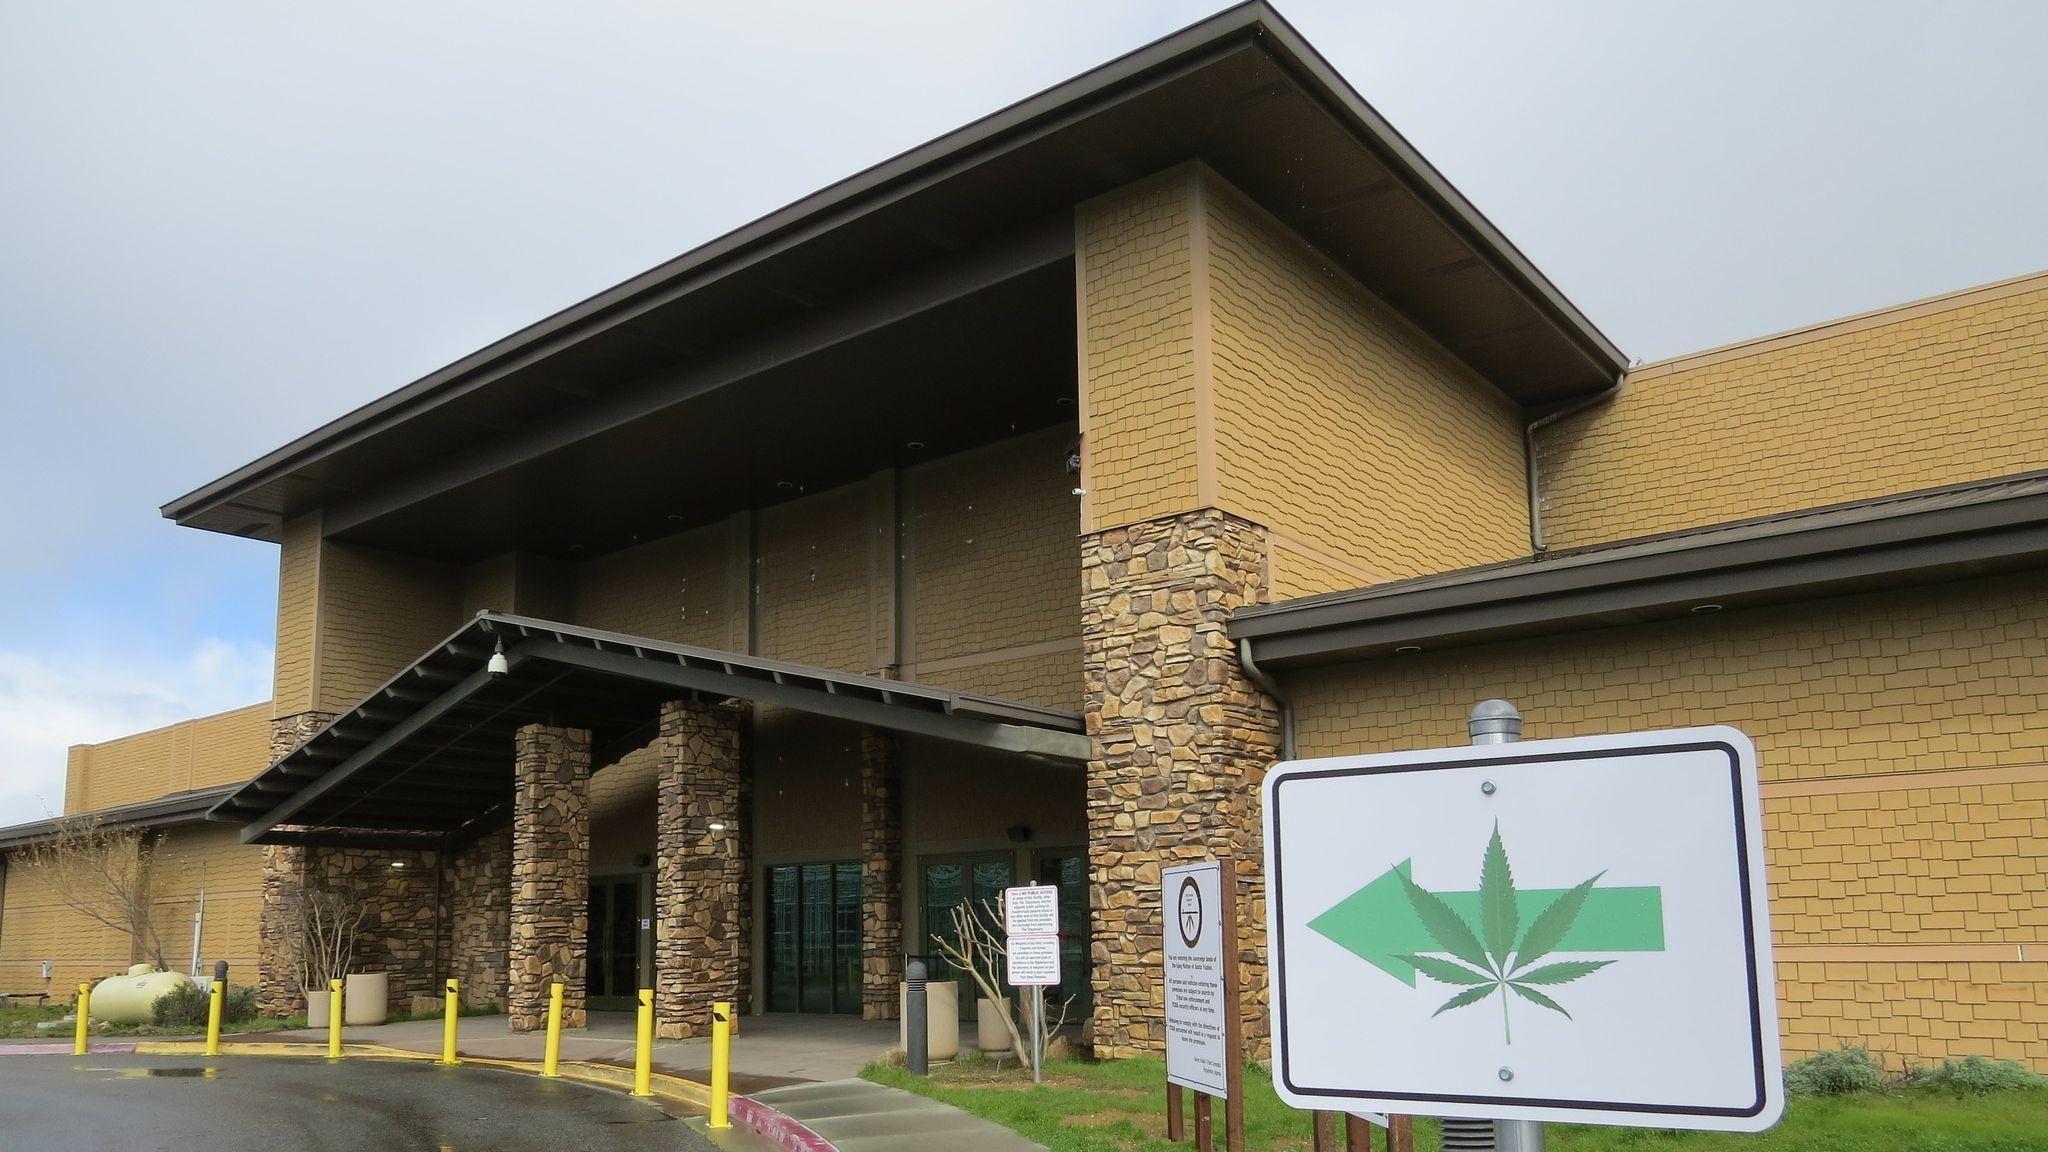 Tribe dips toes into pot trade with dispensary at former Santa Ysabel casino